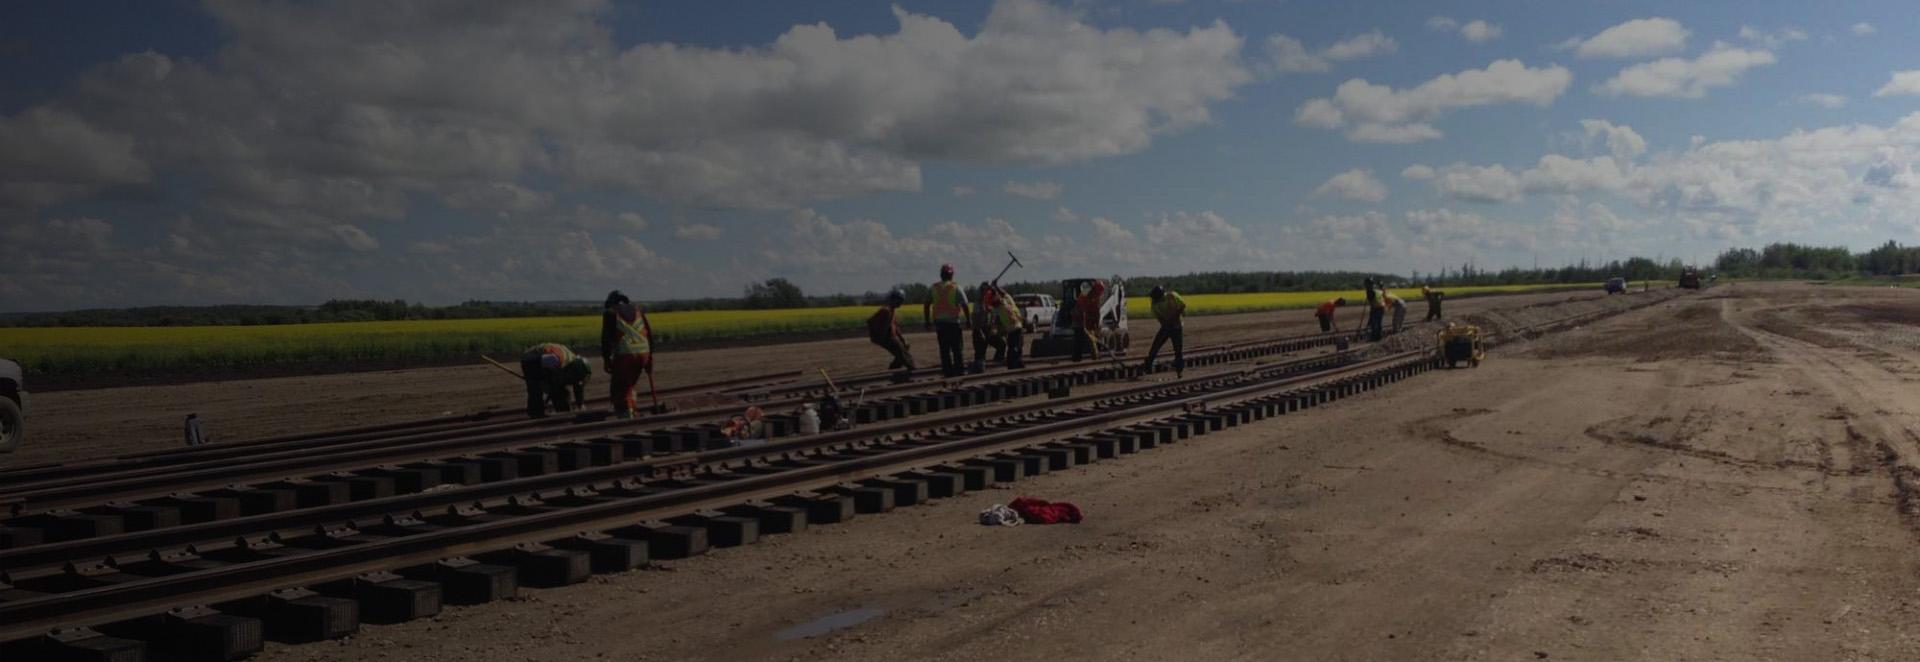 cariboo rail